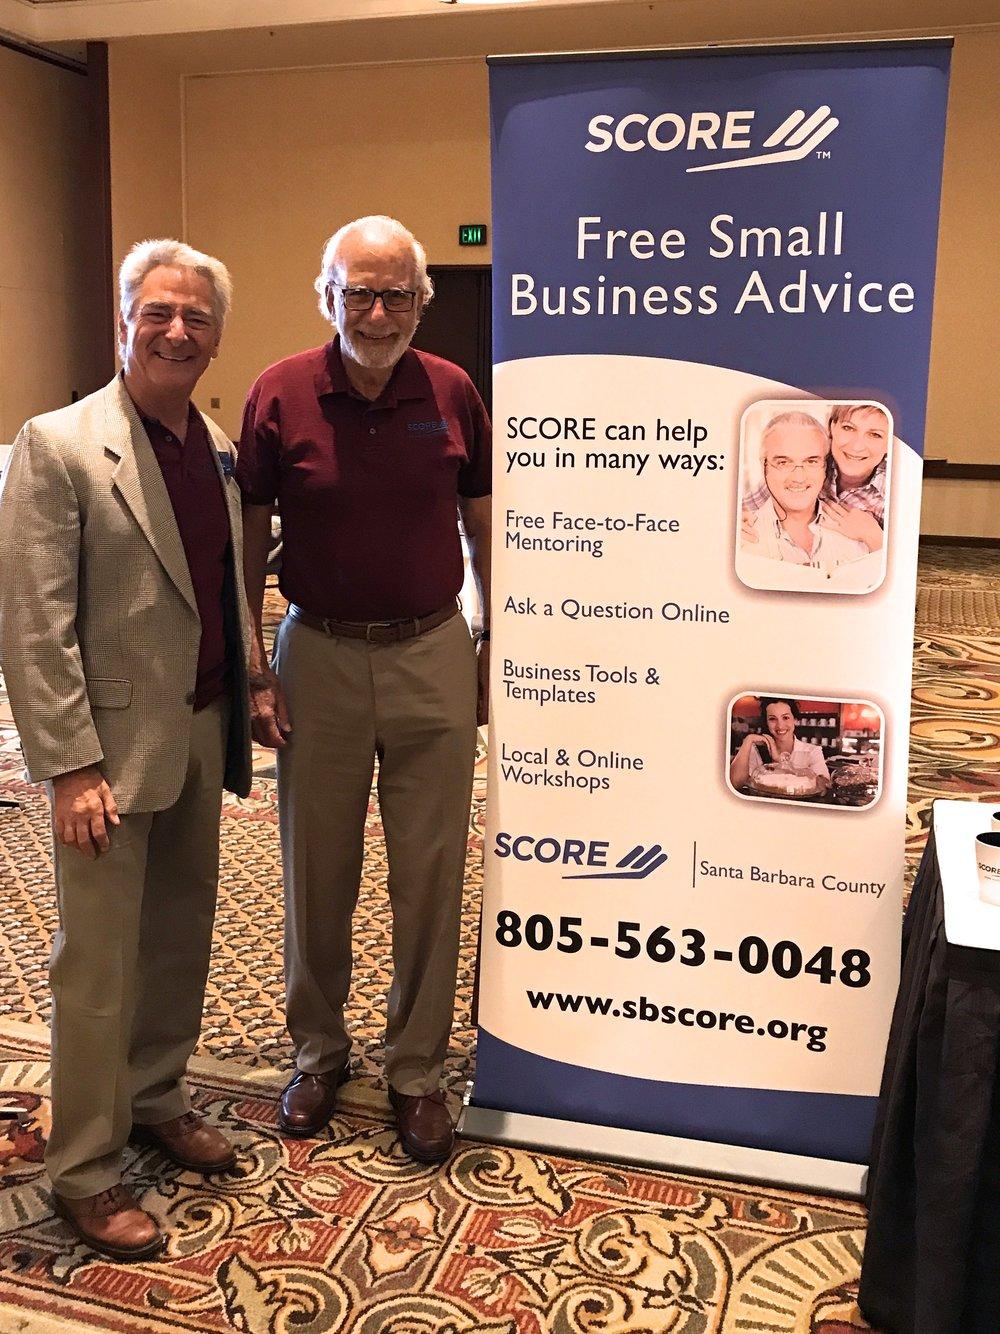 SCORE Santa Barbara Bob Vitamante with Gene Sinser Team of SCORE advisors provided free consultations for this conference.